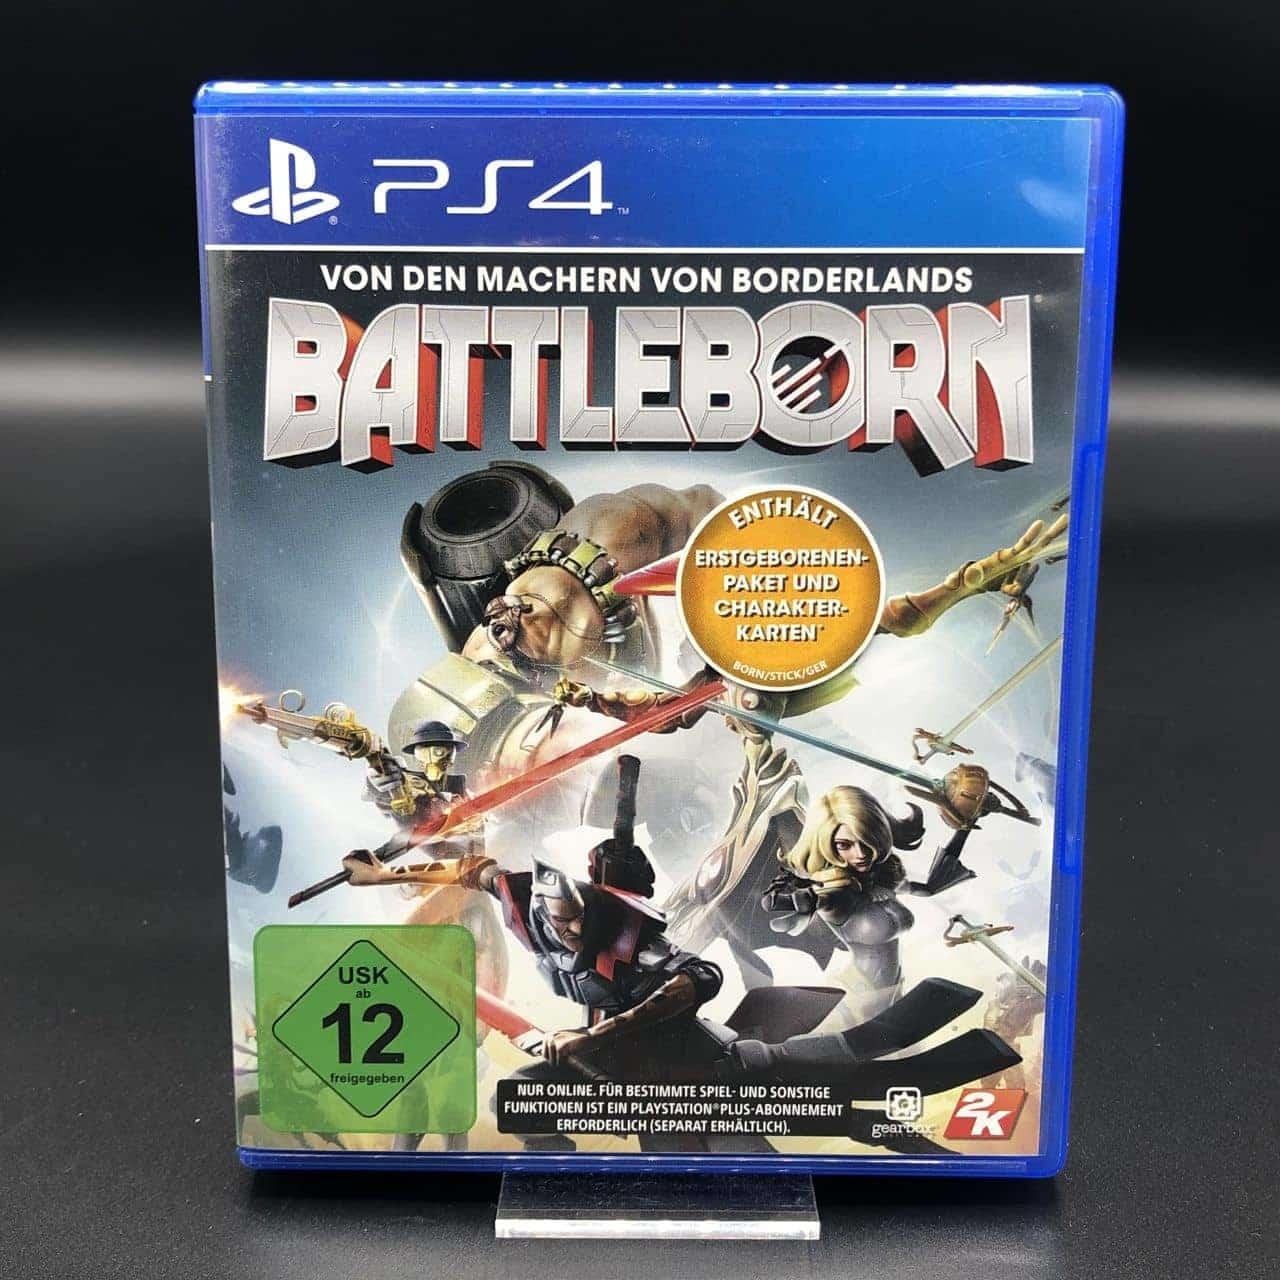 PS4 Battleborn (Sehr gut) Sony PlayStation 4